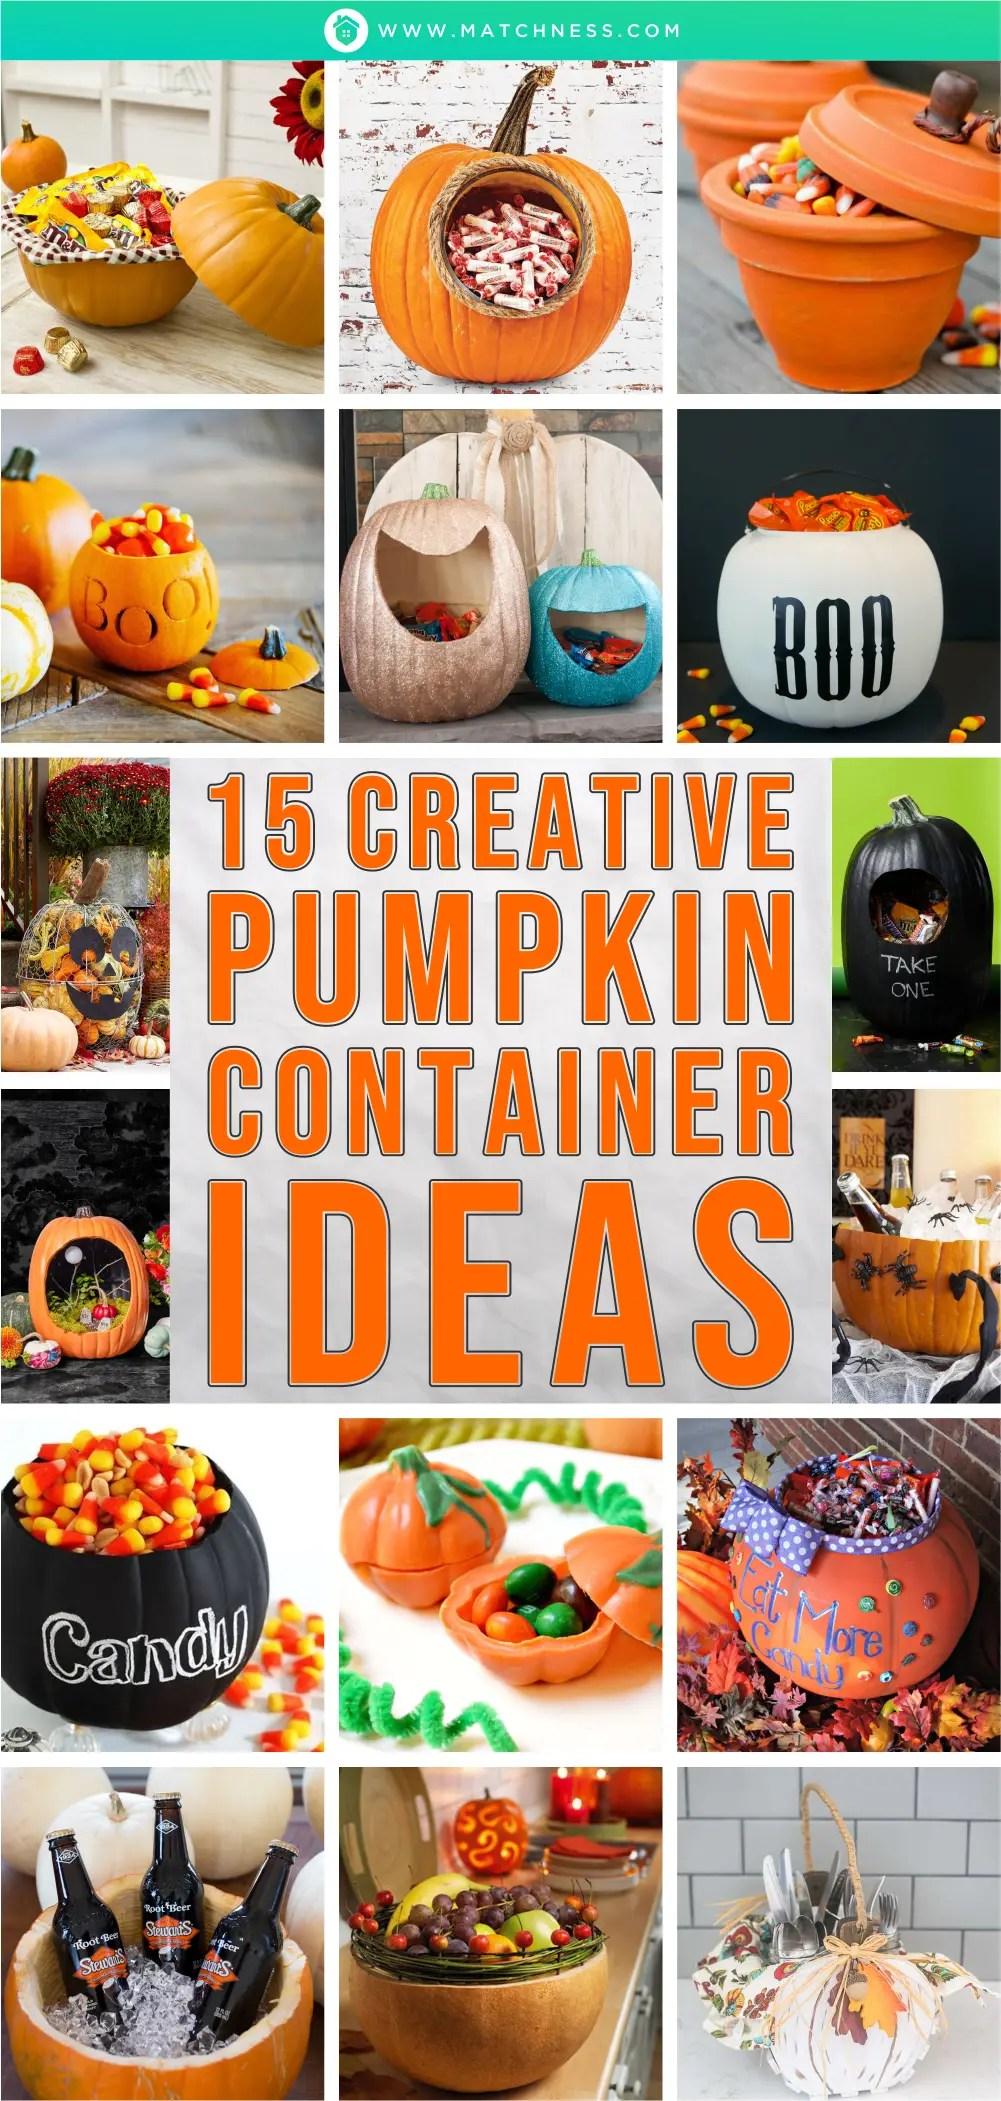 15-creative-pumpkin-container-ideas1